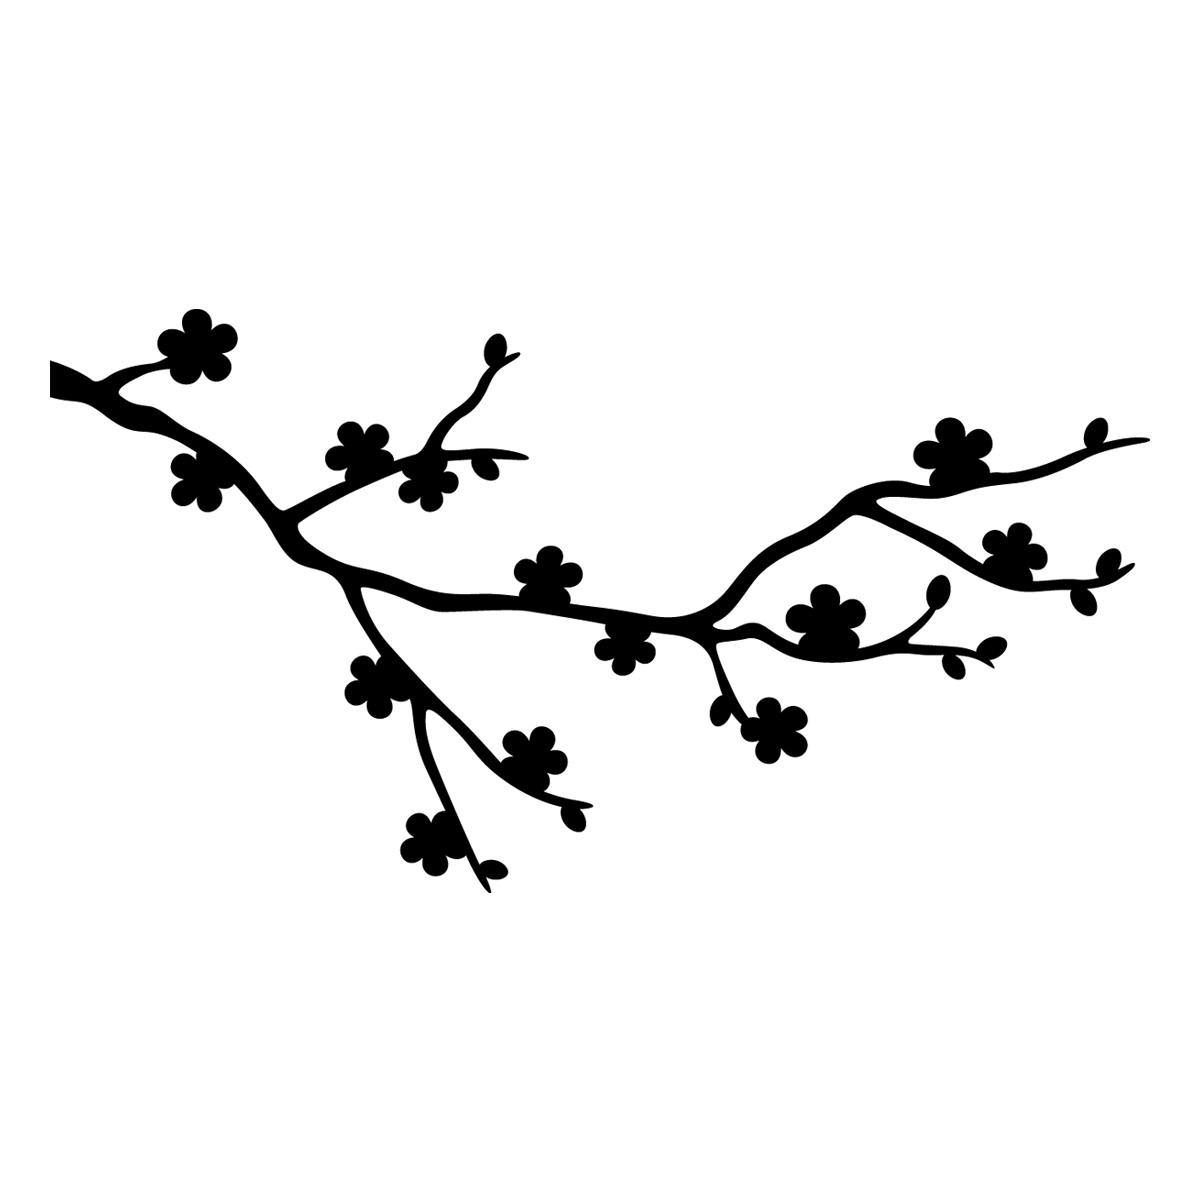 Fortnite Wallpaper Falling From The Sky Stickers Ordinateurs Portables Sticker Fleurs De